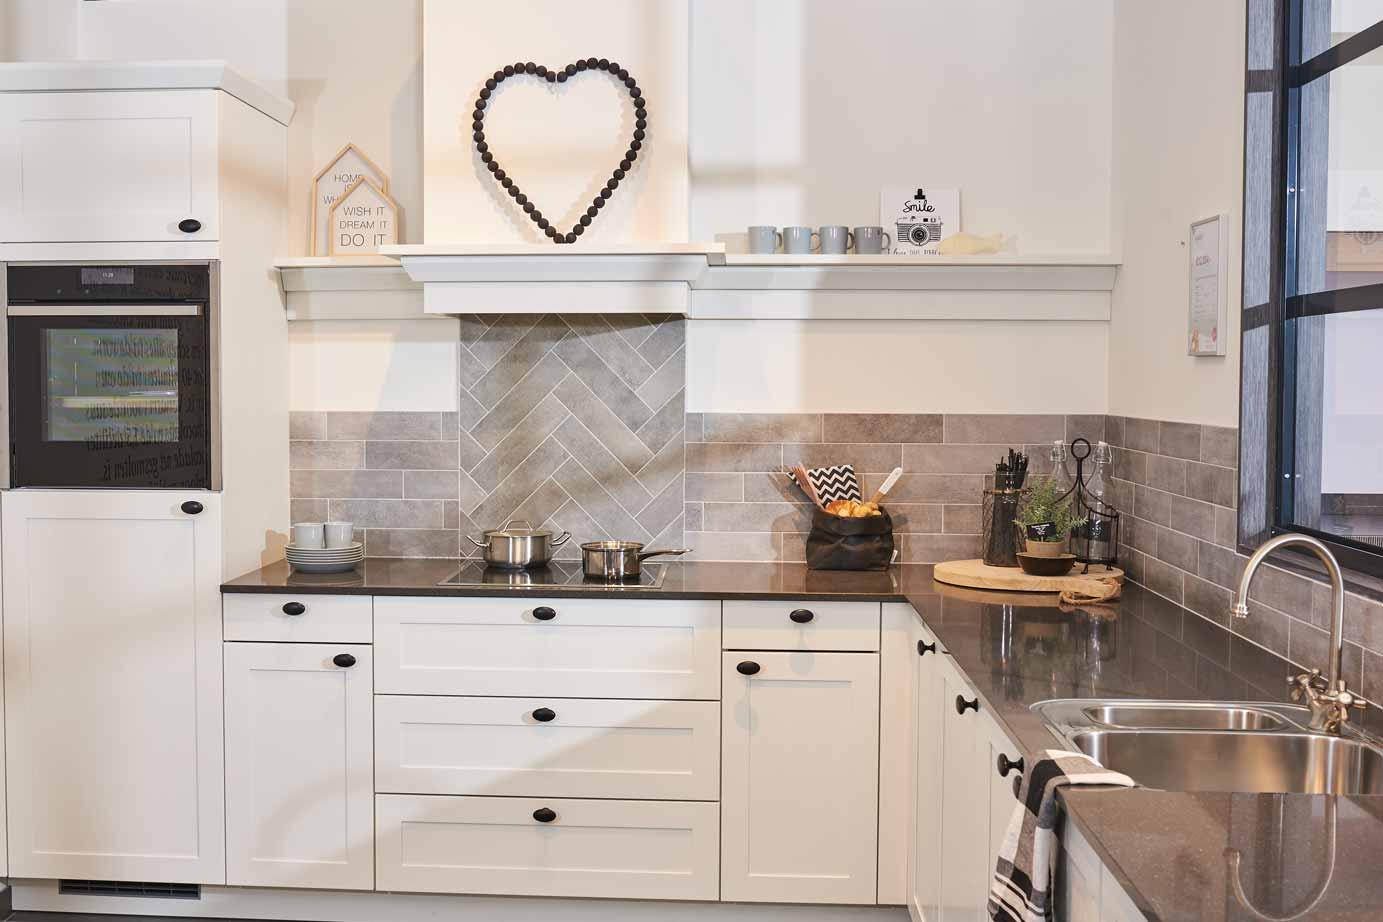 Kleur keuken kiezen finest verf en toebehoren with kleur keuken